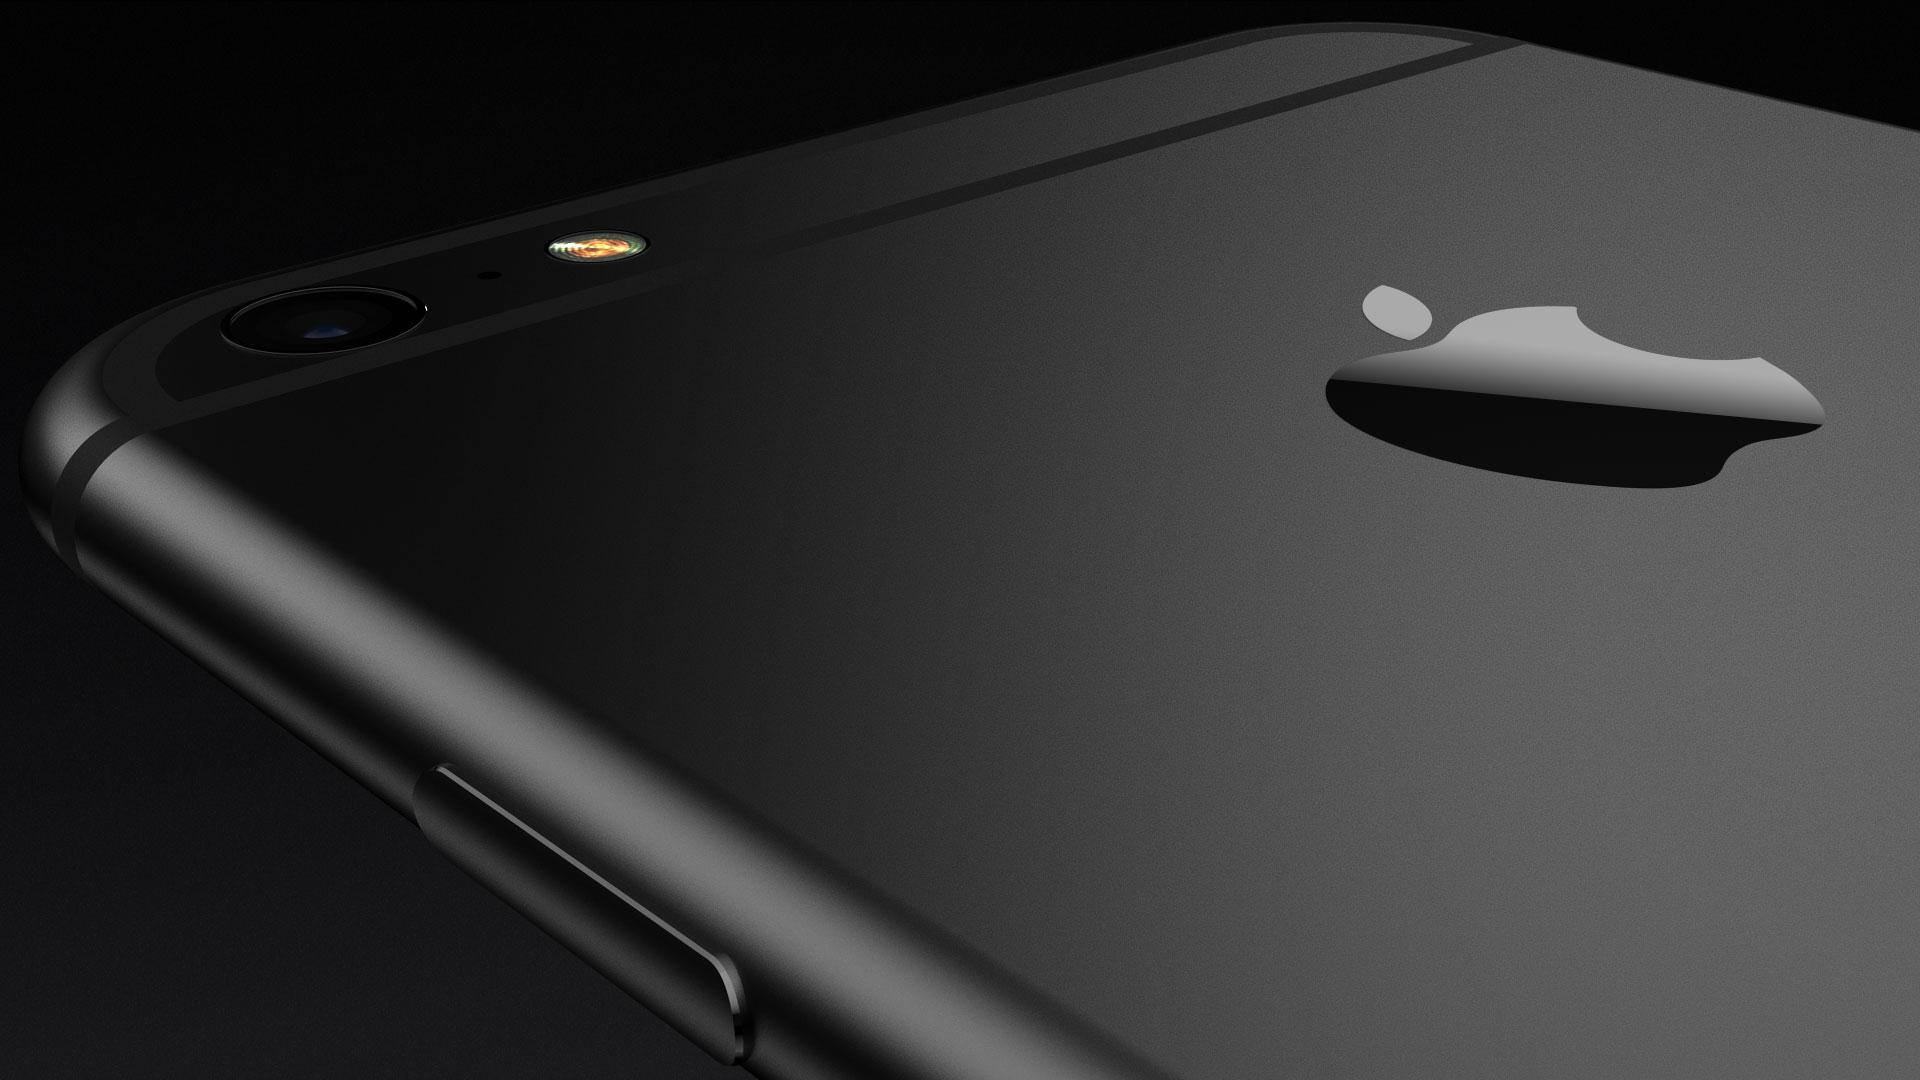 Zwarte iPhone 7